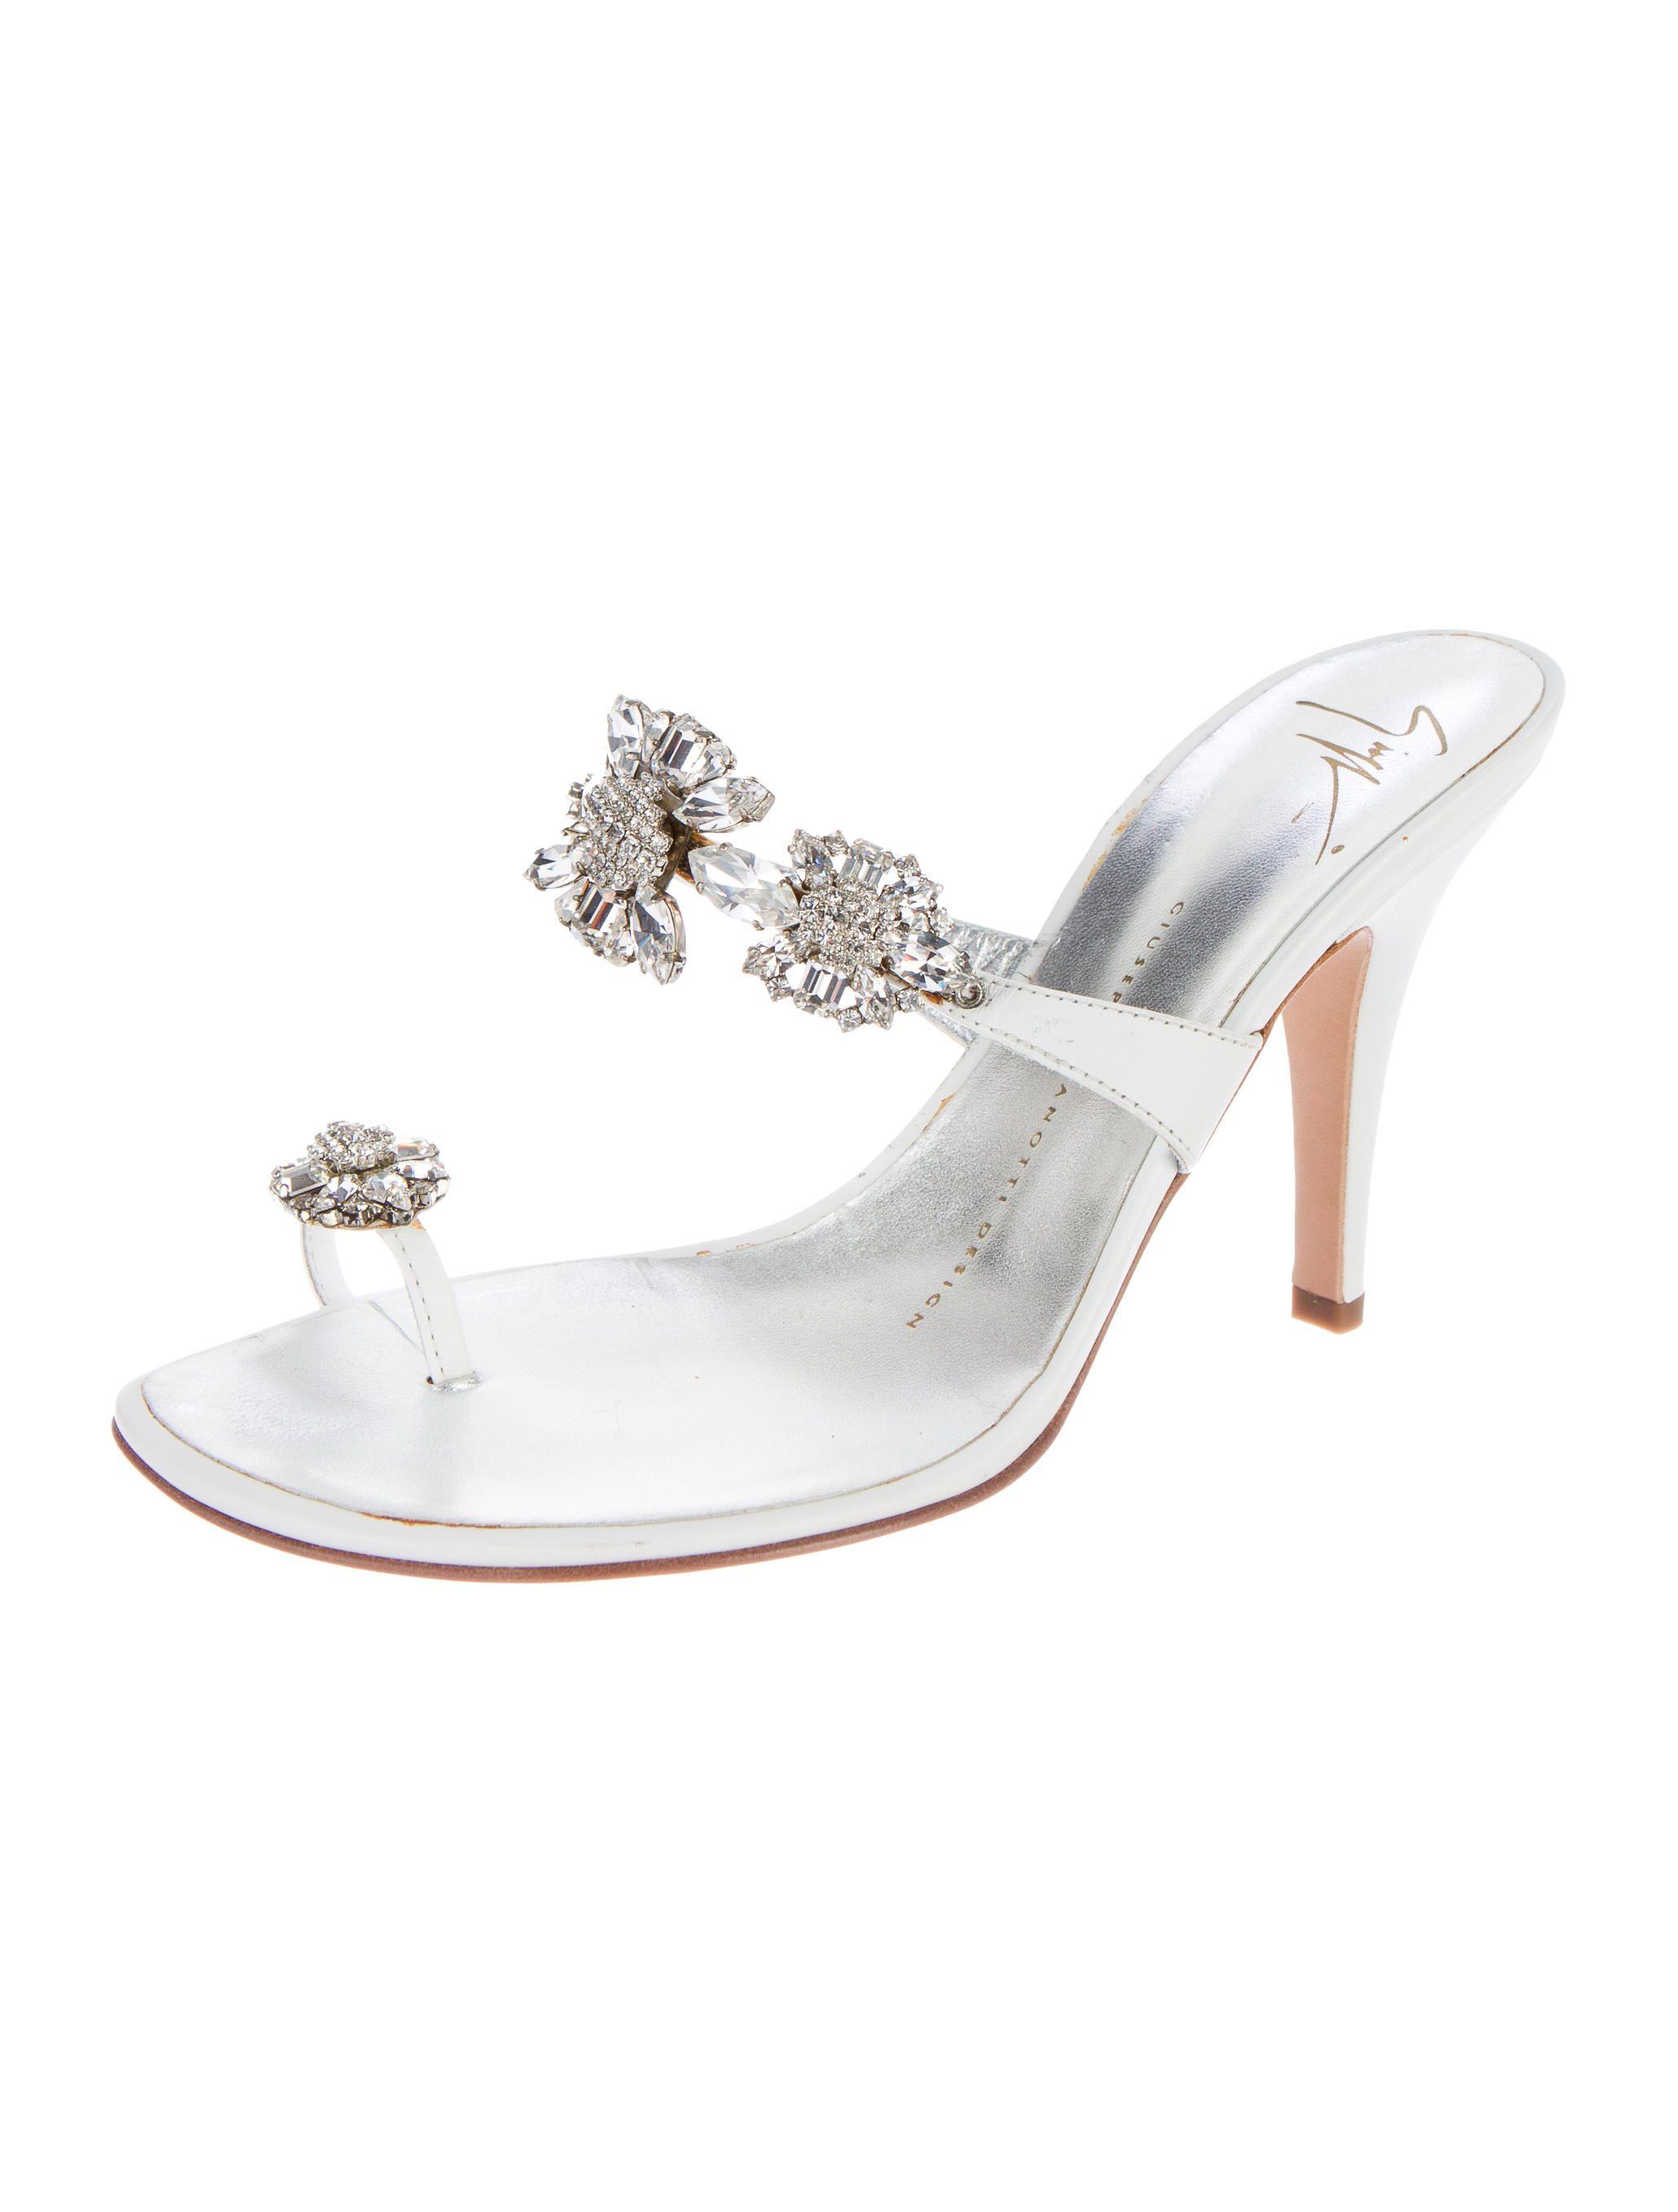 0d9faede2a Giuseppe Zanotti Embellished Slide Sandals - Shoes - GIU33012   The RealReal